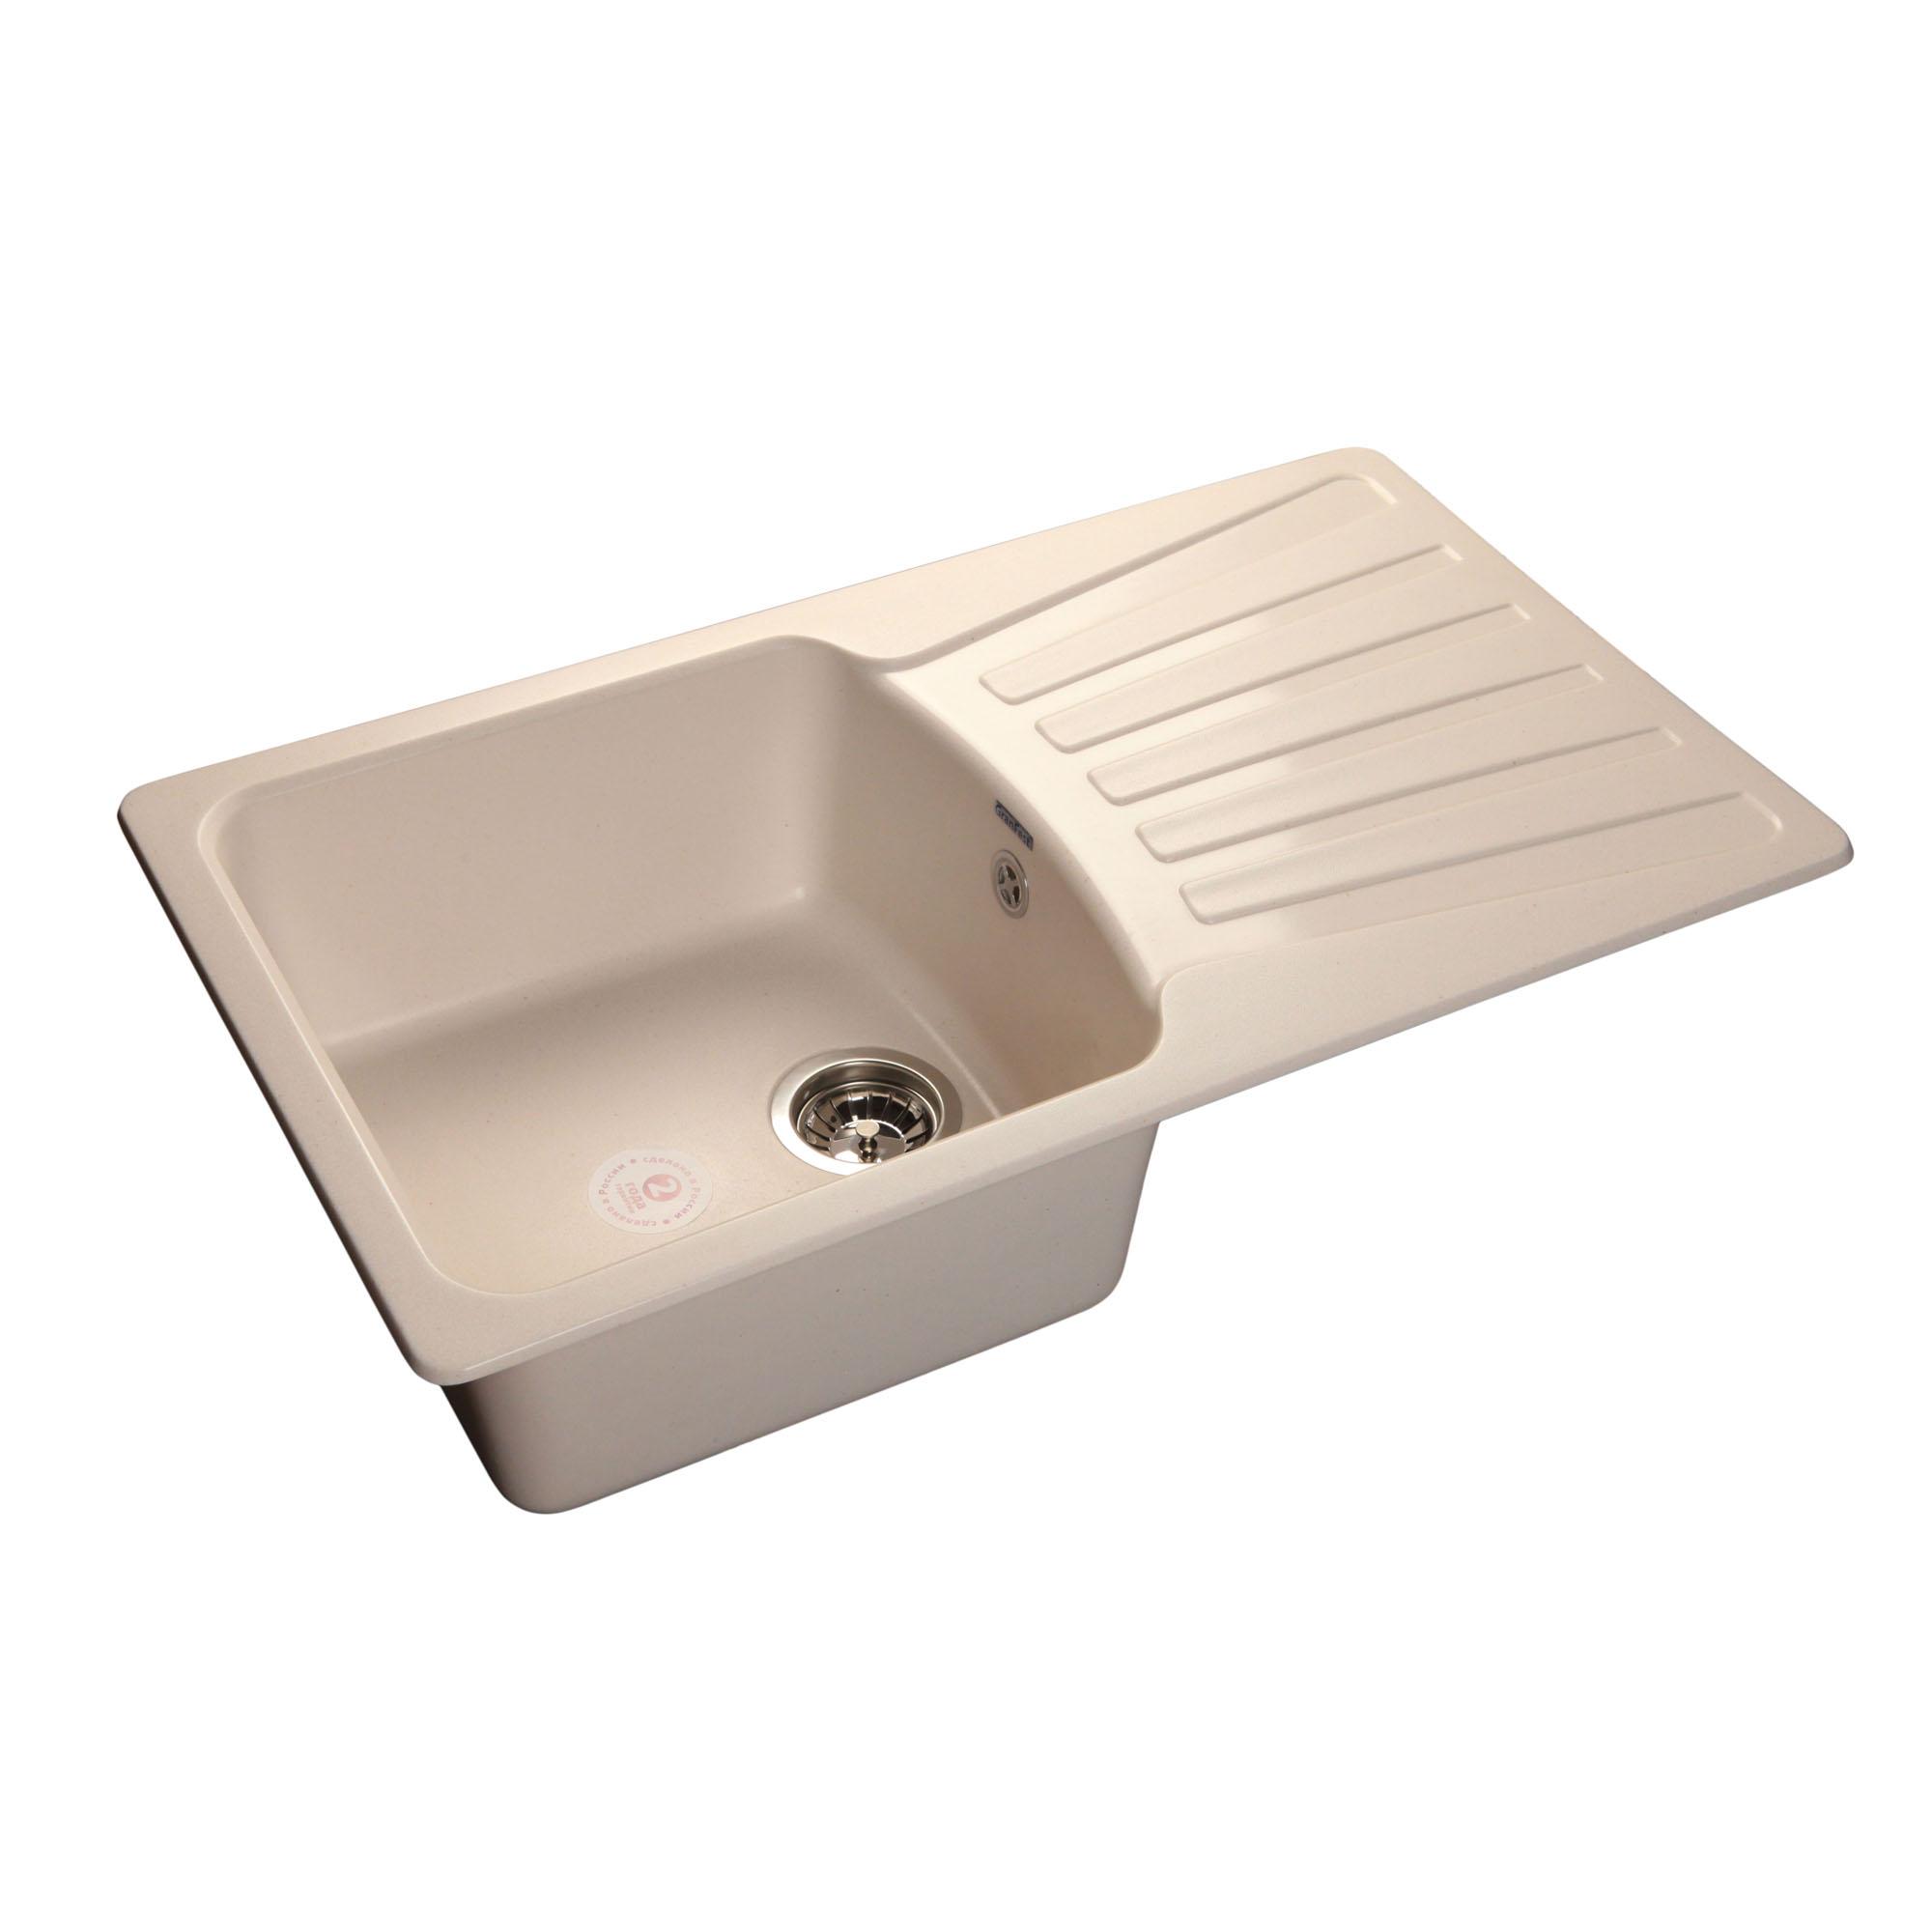 Кухонная мойка GranFest Standart GF-S850L белый мойка кухонная granfest гранит 850x495 gf s850l терракот